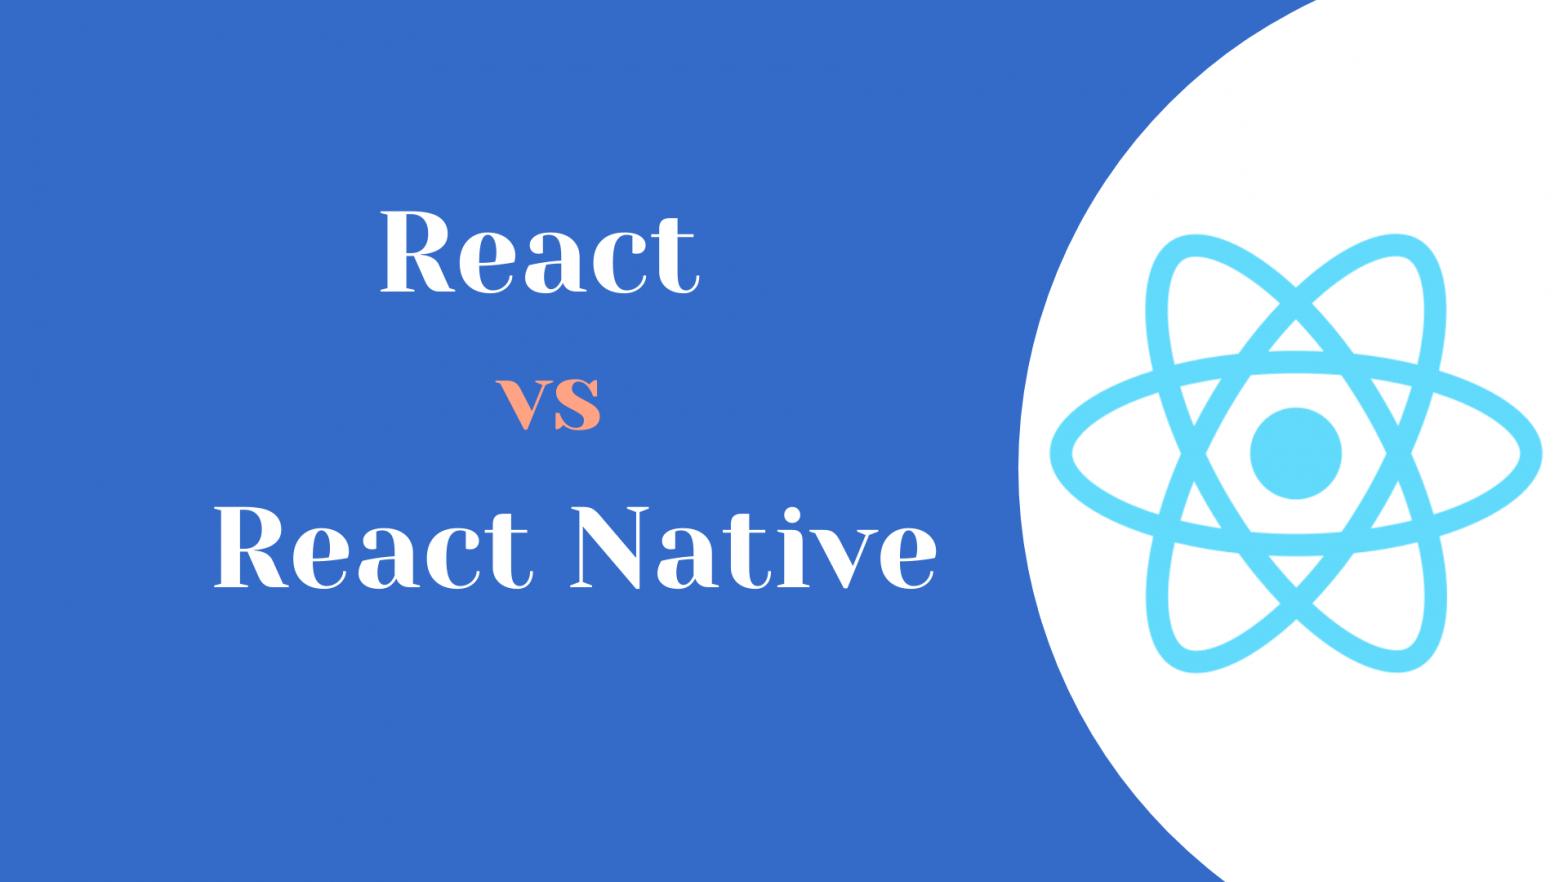 React vs React Native